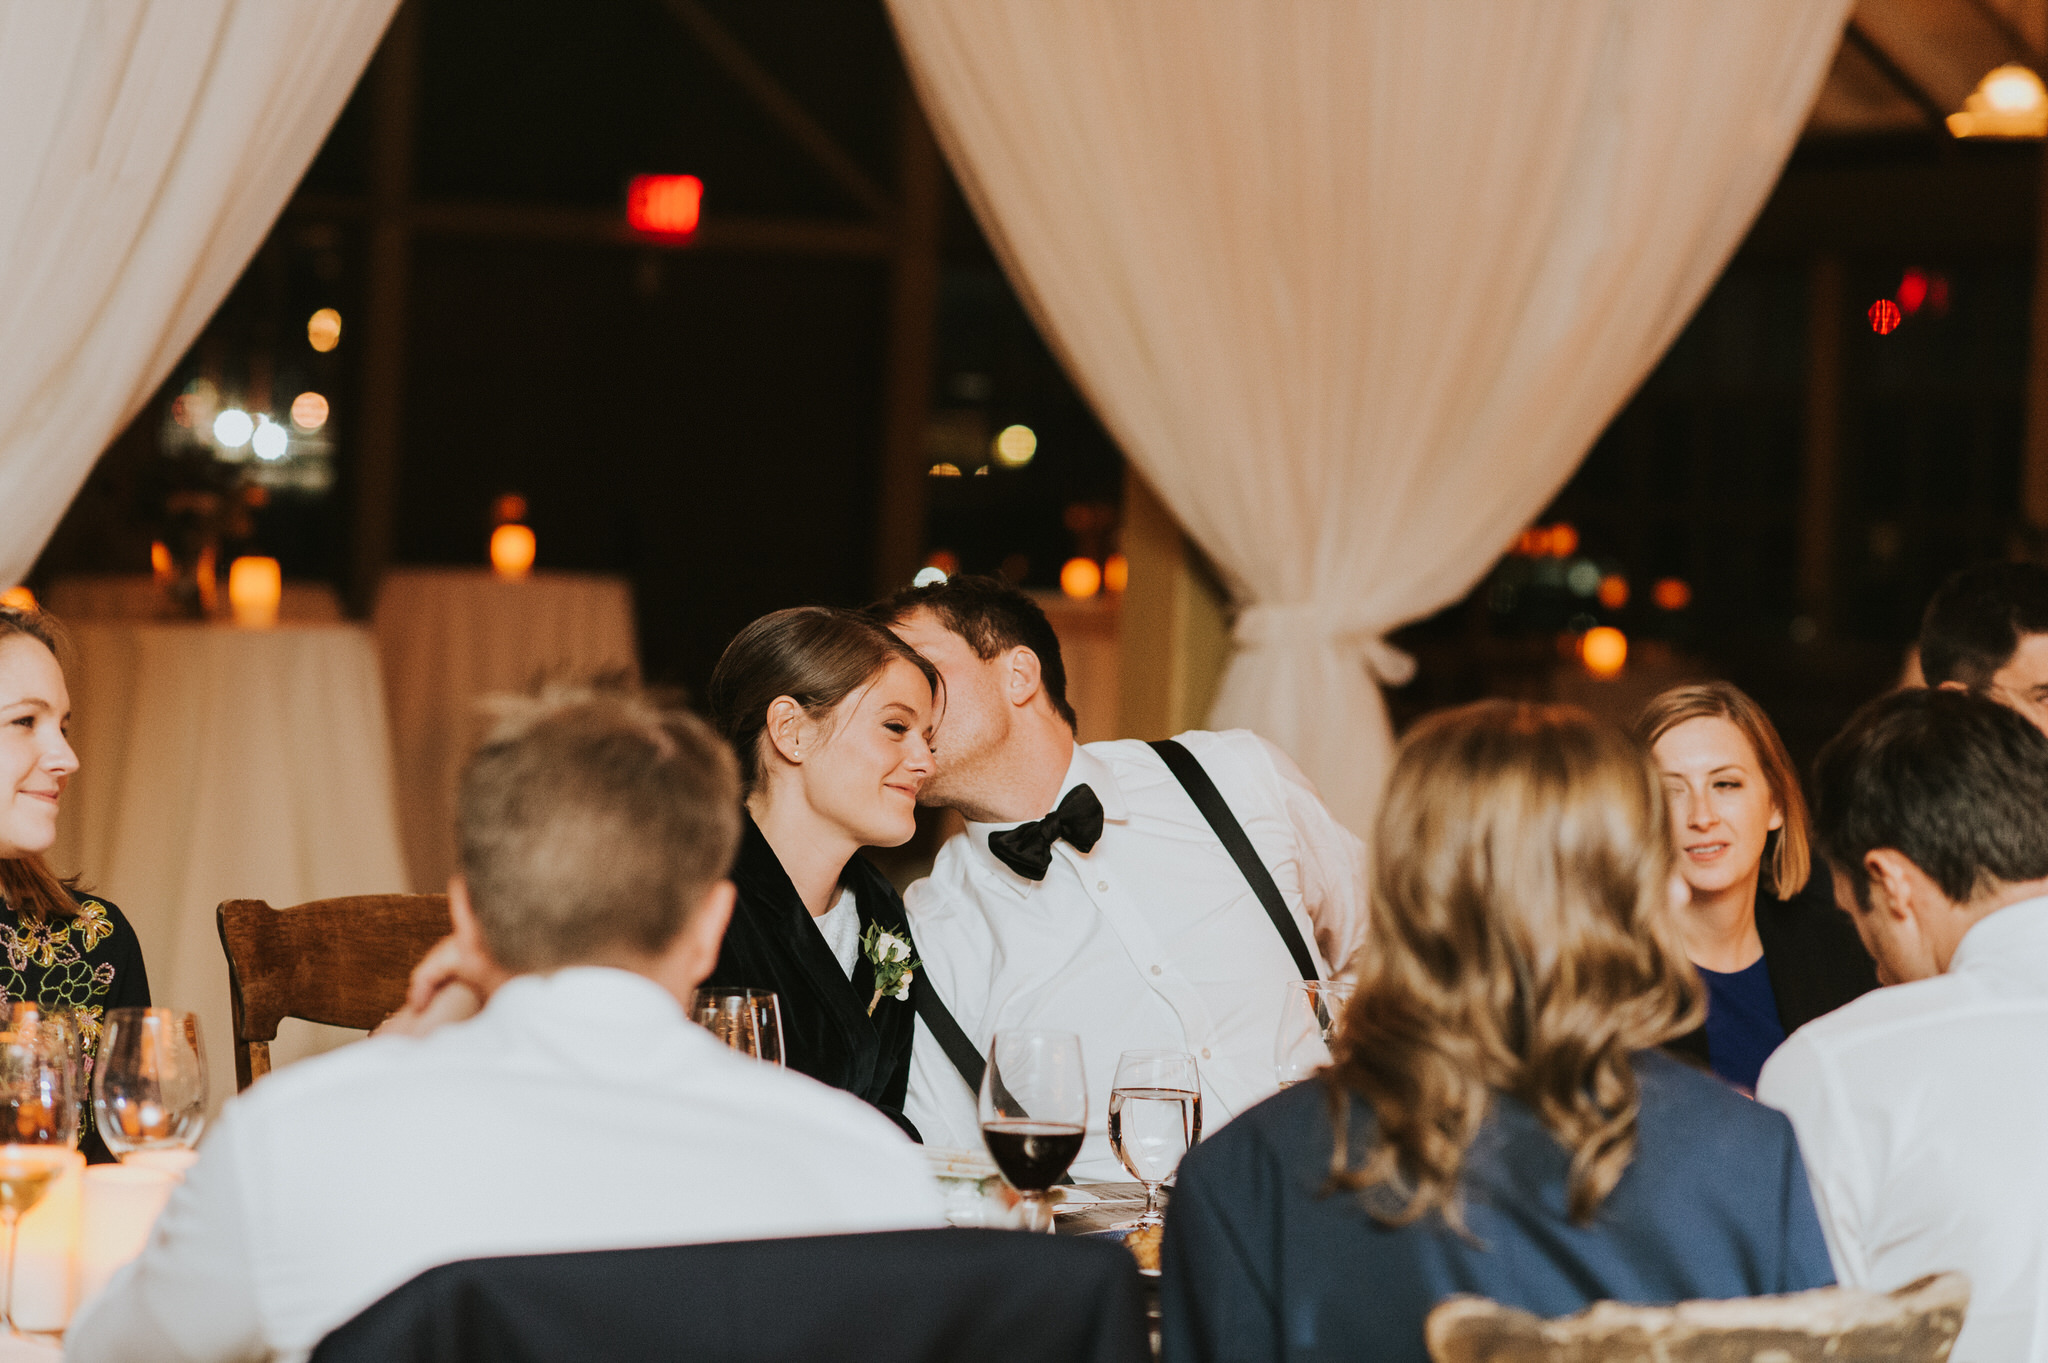 scarletoneillphotography_weddingphotography_prince edward county weddings152.JPG